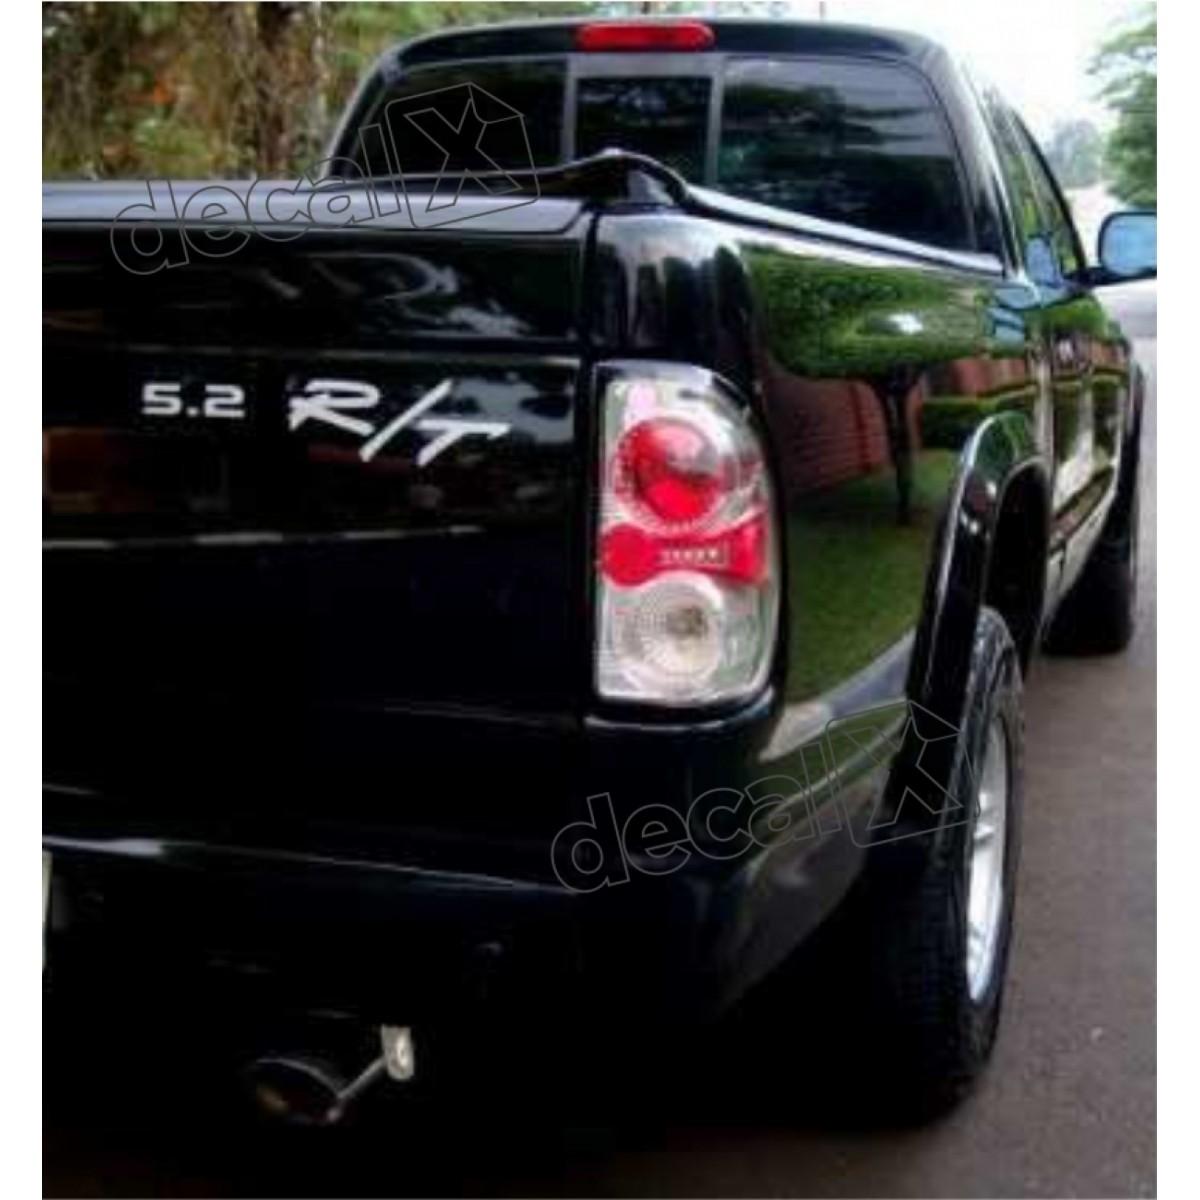 Kit Adesivos Dodge Dakota 5.2 R/t Em Prata Decalx